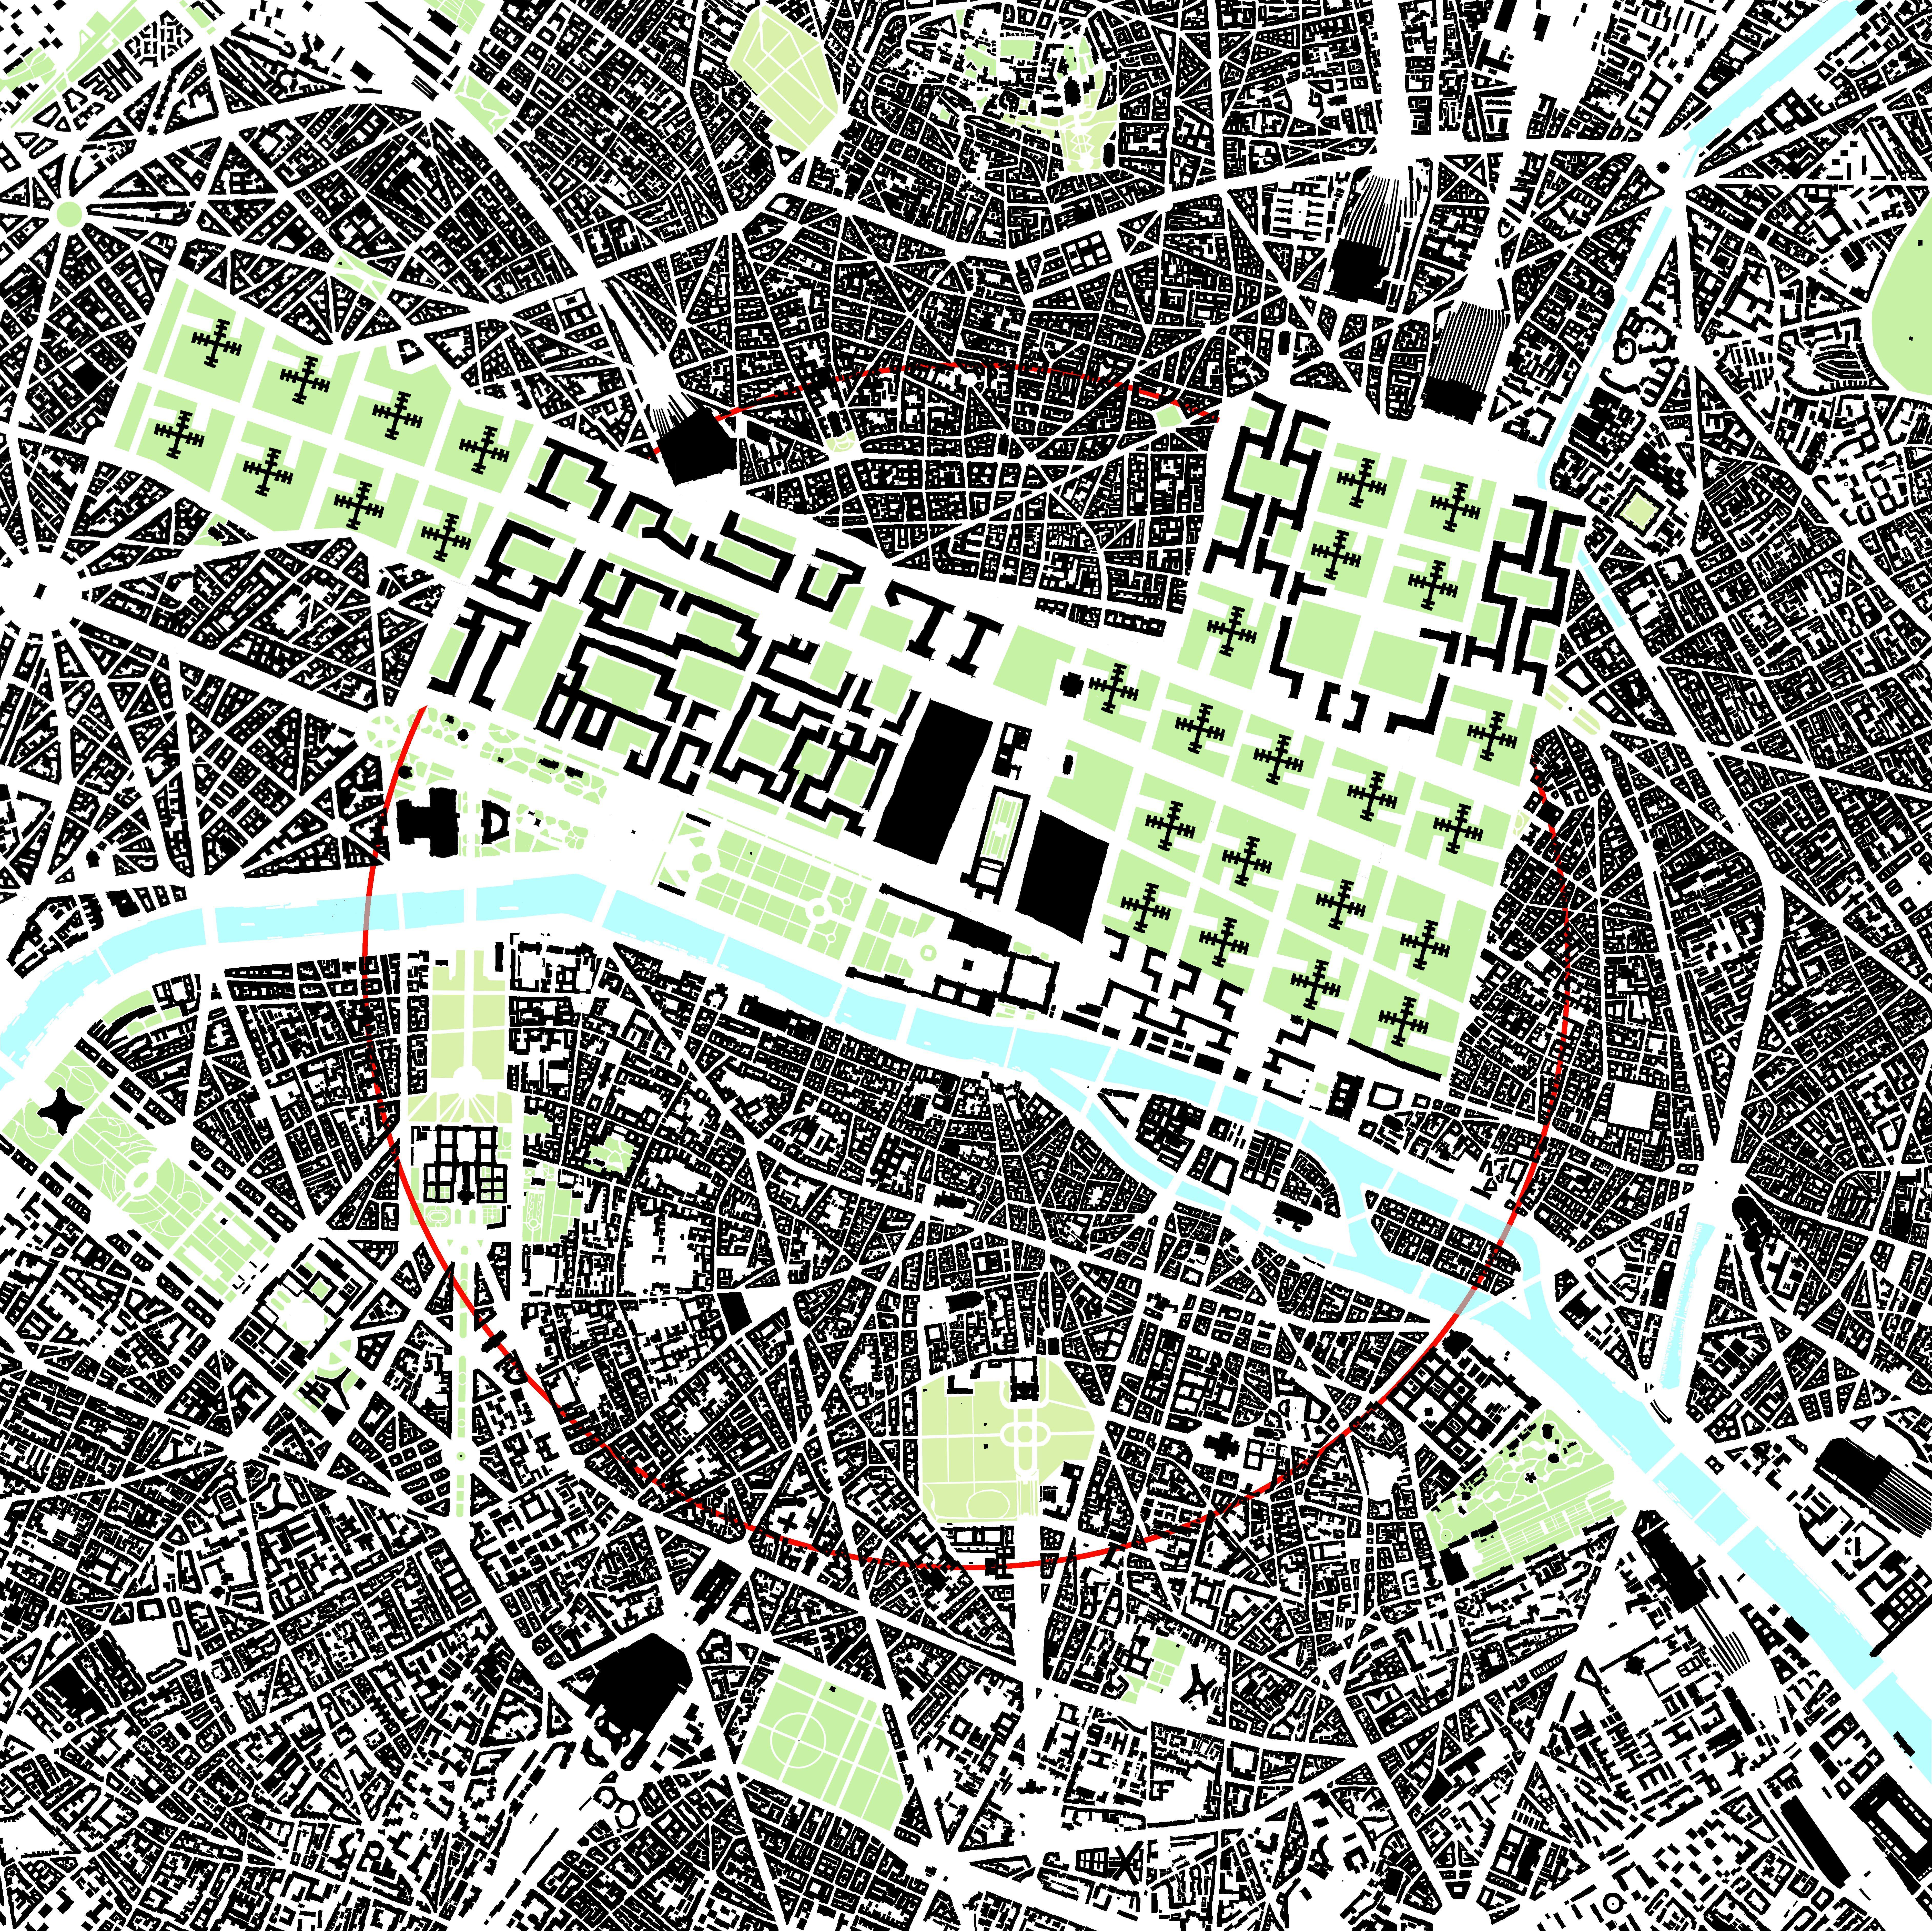 Figure ground map of Le Corbusier s urban plan for Paris 1920 s